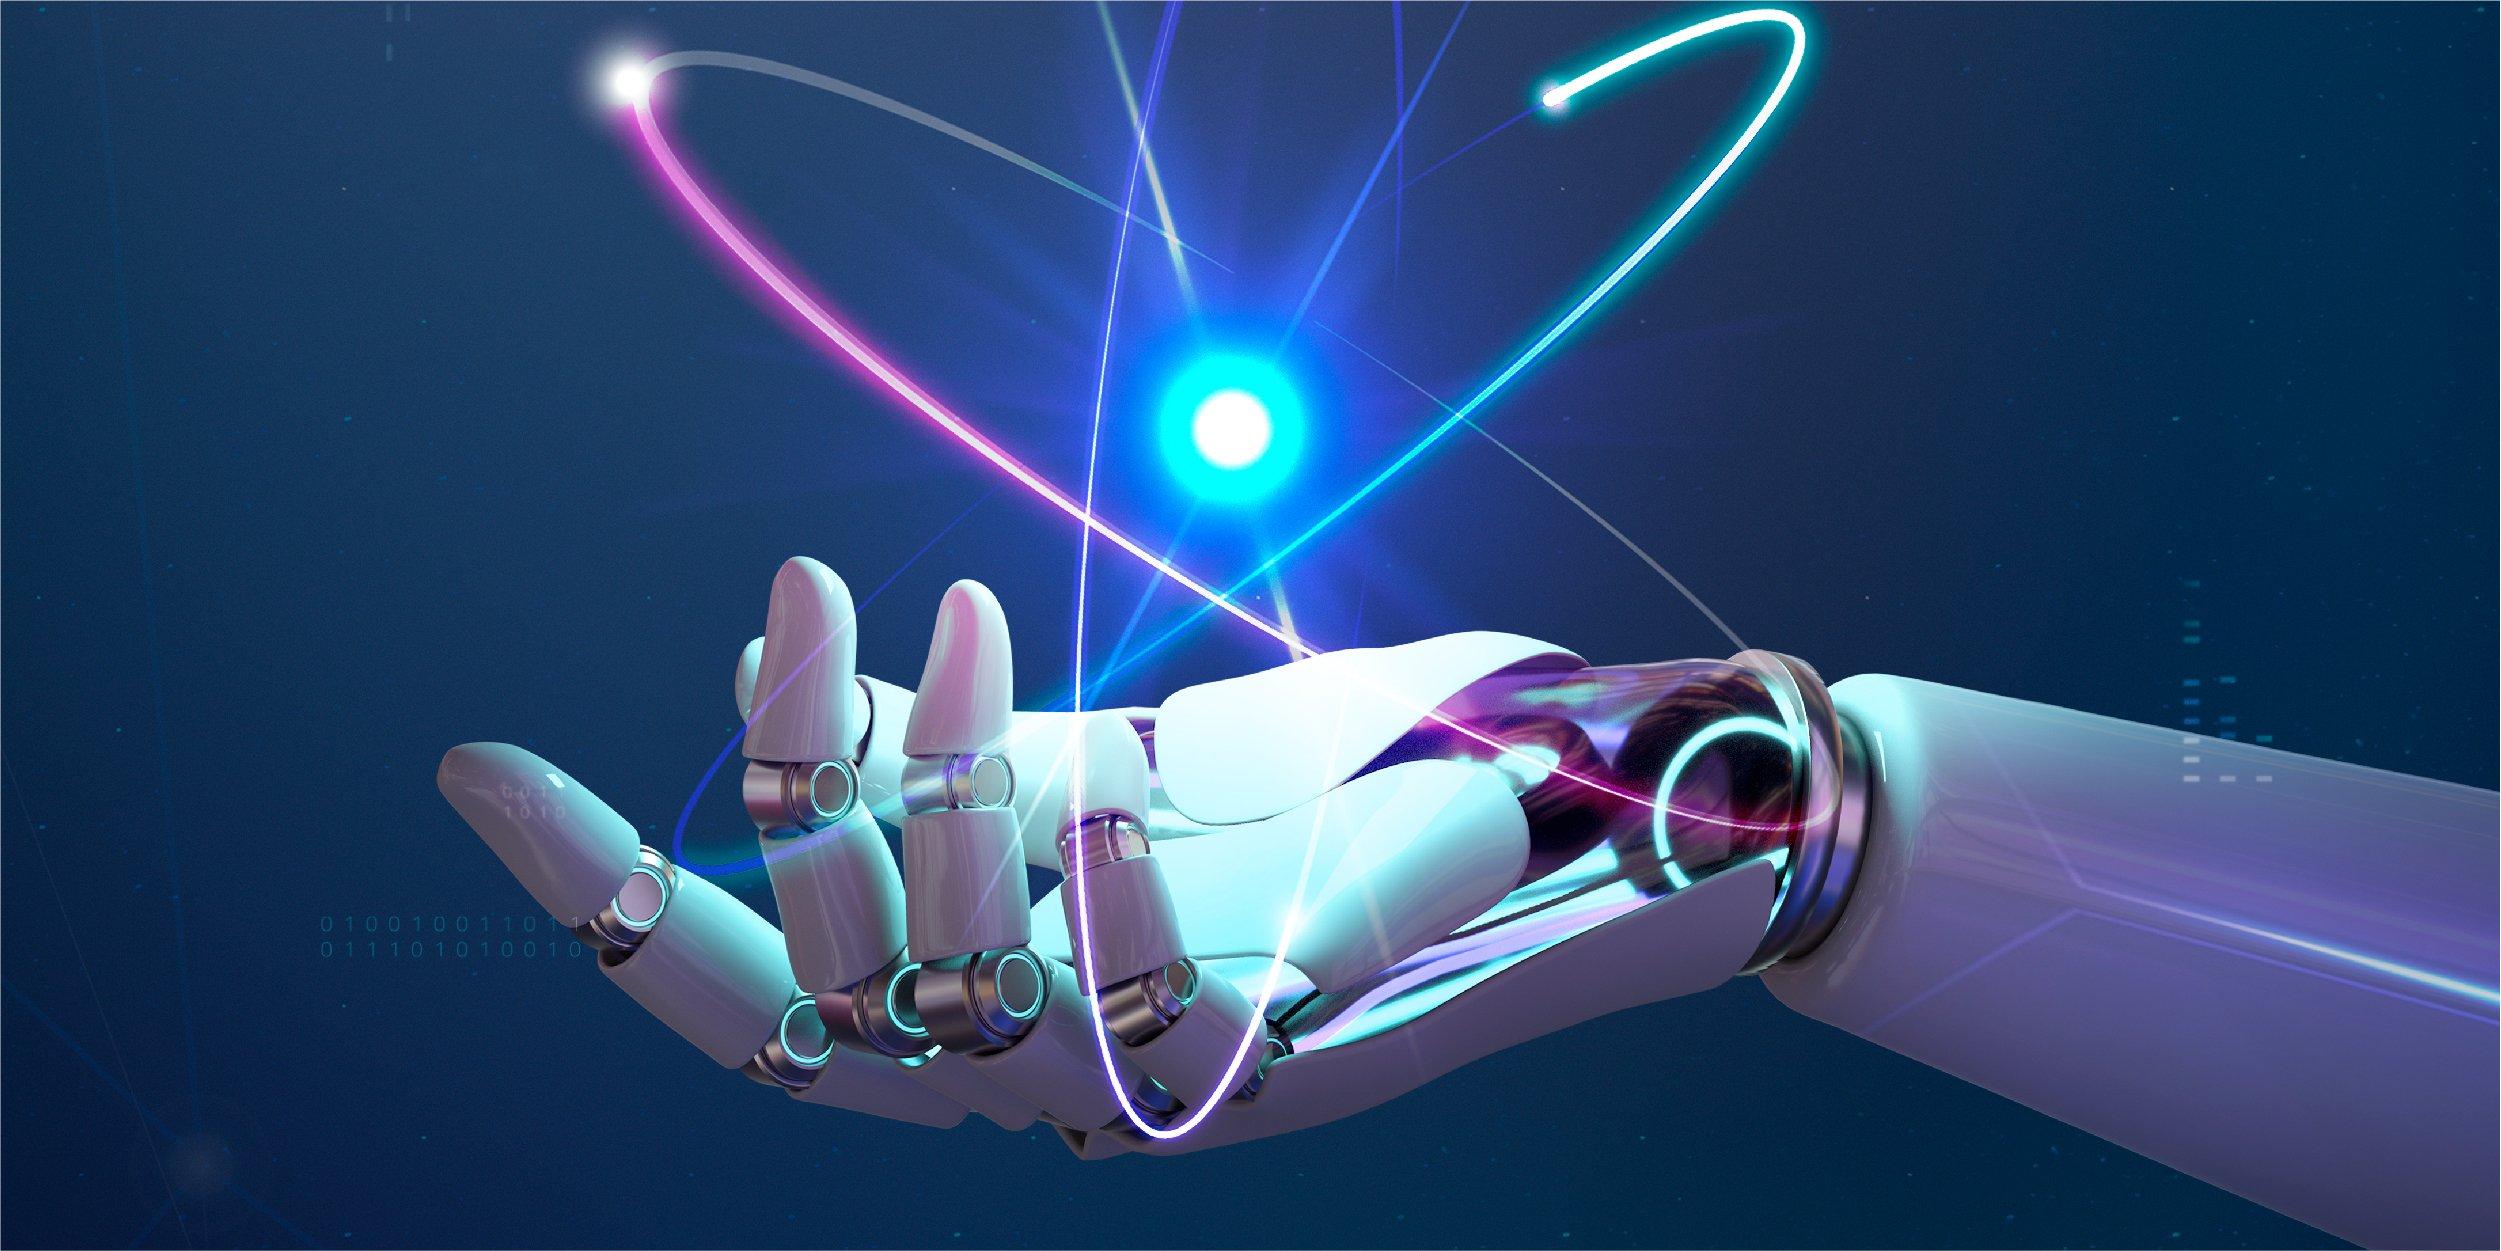 ai-nuclear-energy-background-future-innovation-disruptive-technology_Blog copy